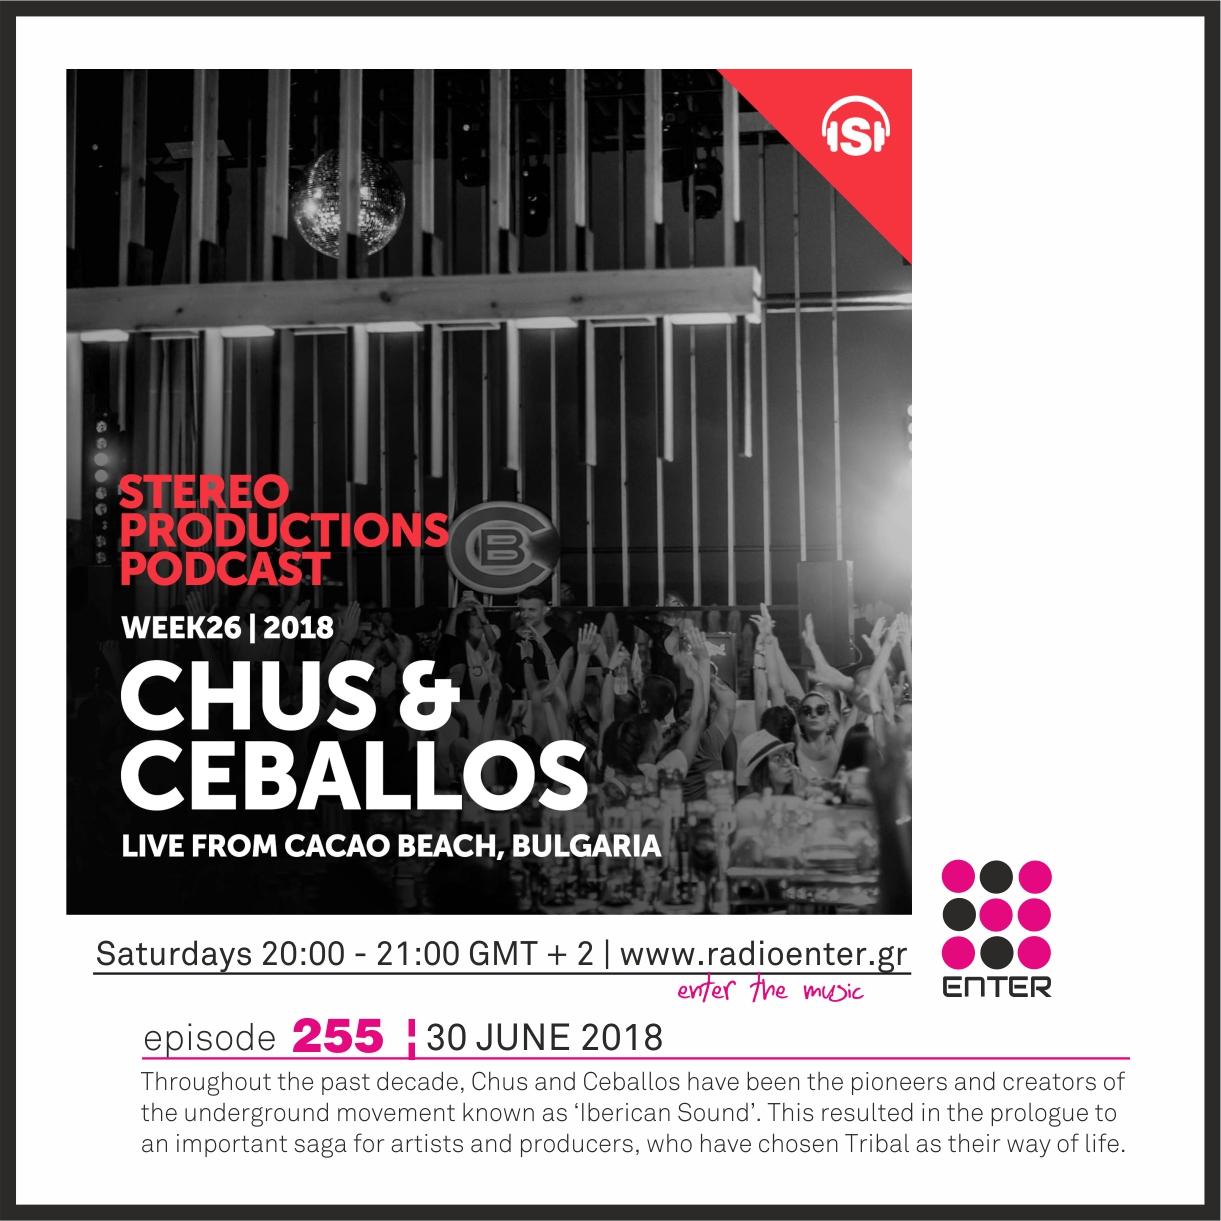 2018.06.30 - Chus & Ceballos Stereo Productions Podcast 255